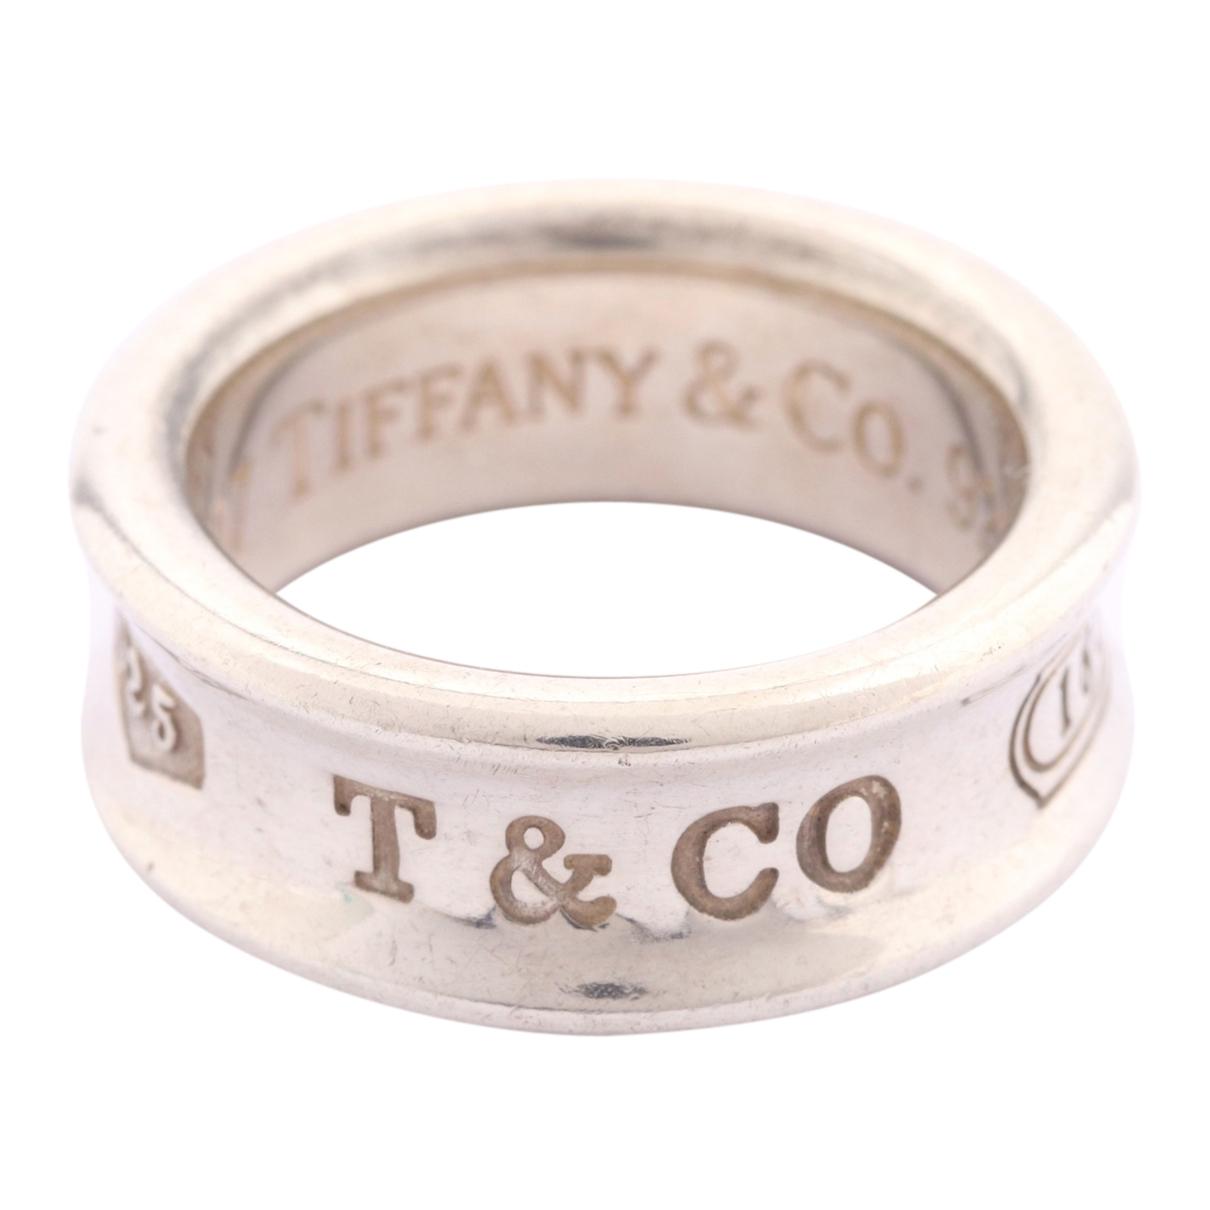 Tiffany & Co Tiffany 1837 Ring in  Silber Silber